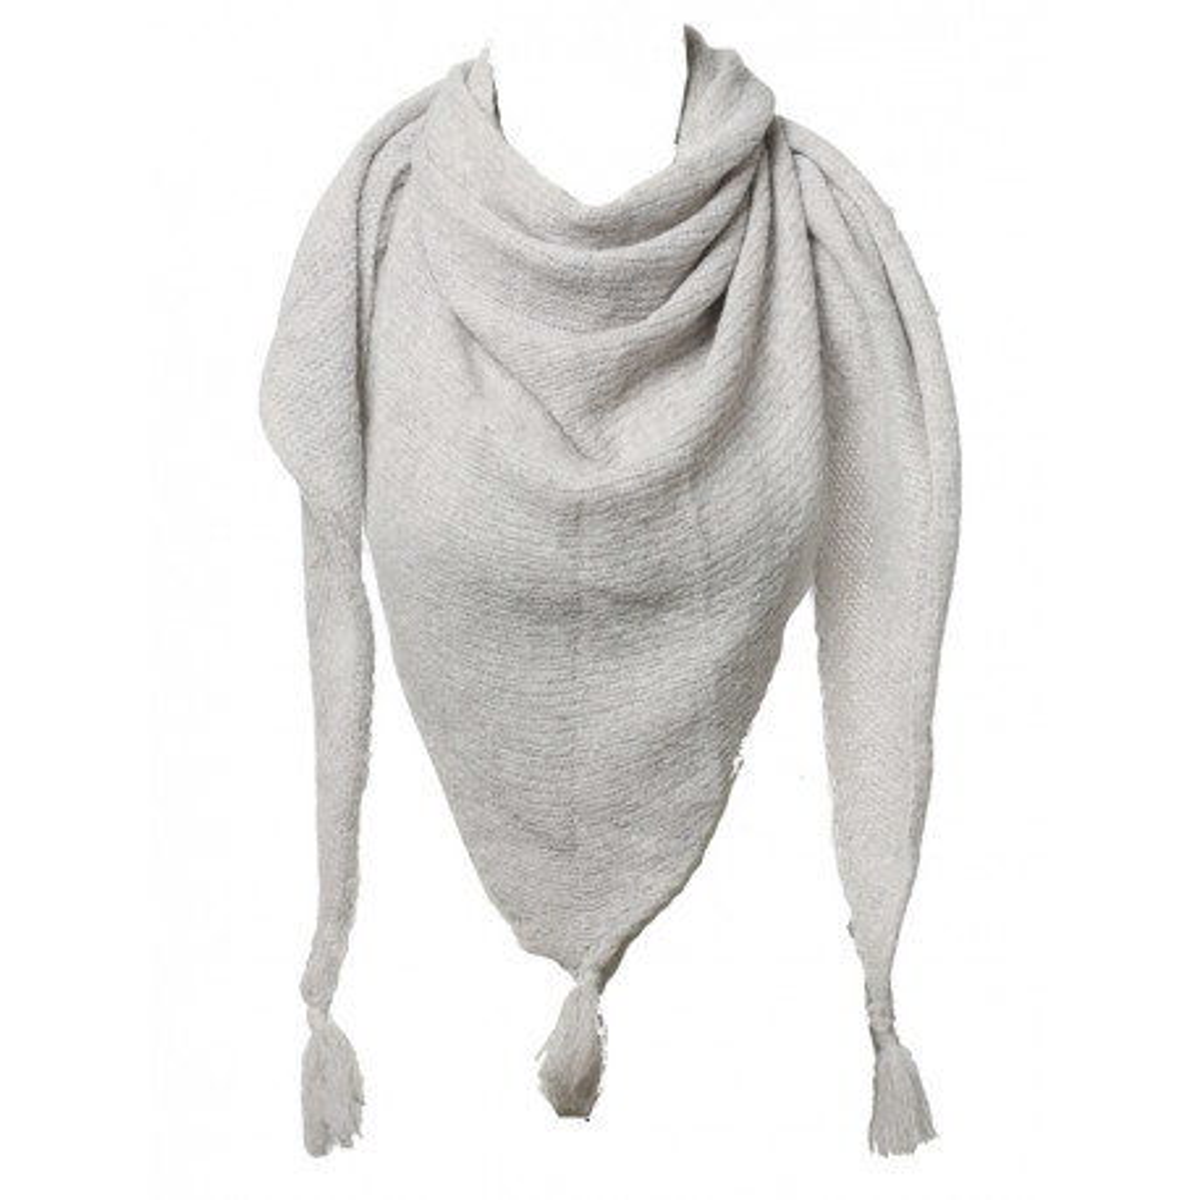 Etole écharpe triangle laine beige neige